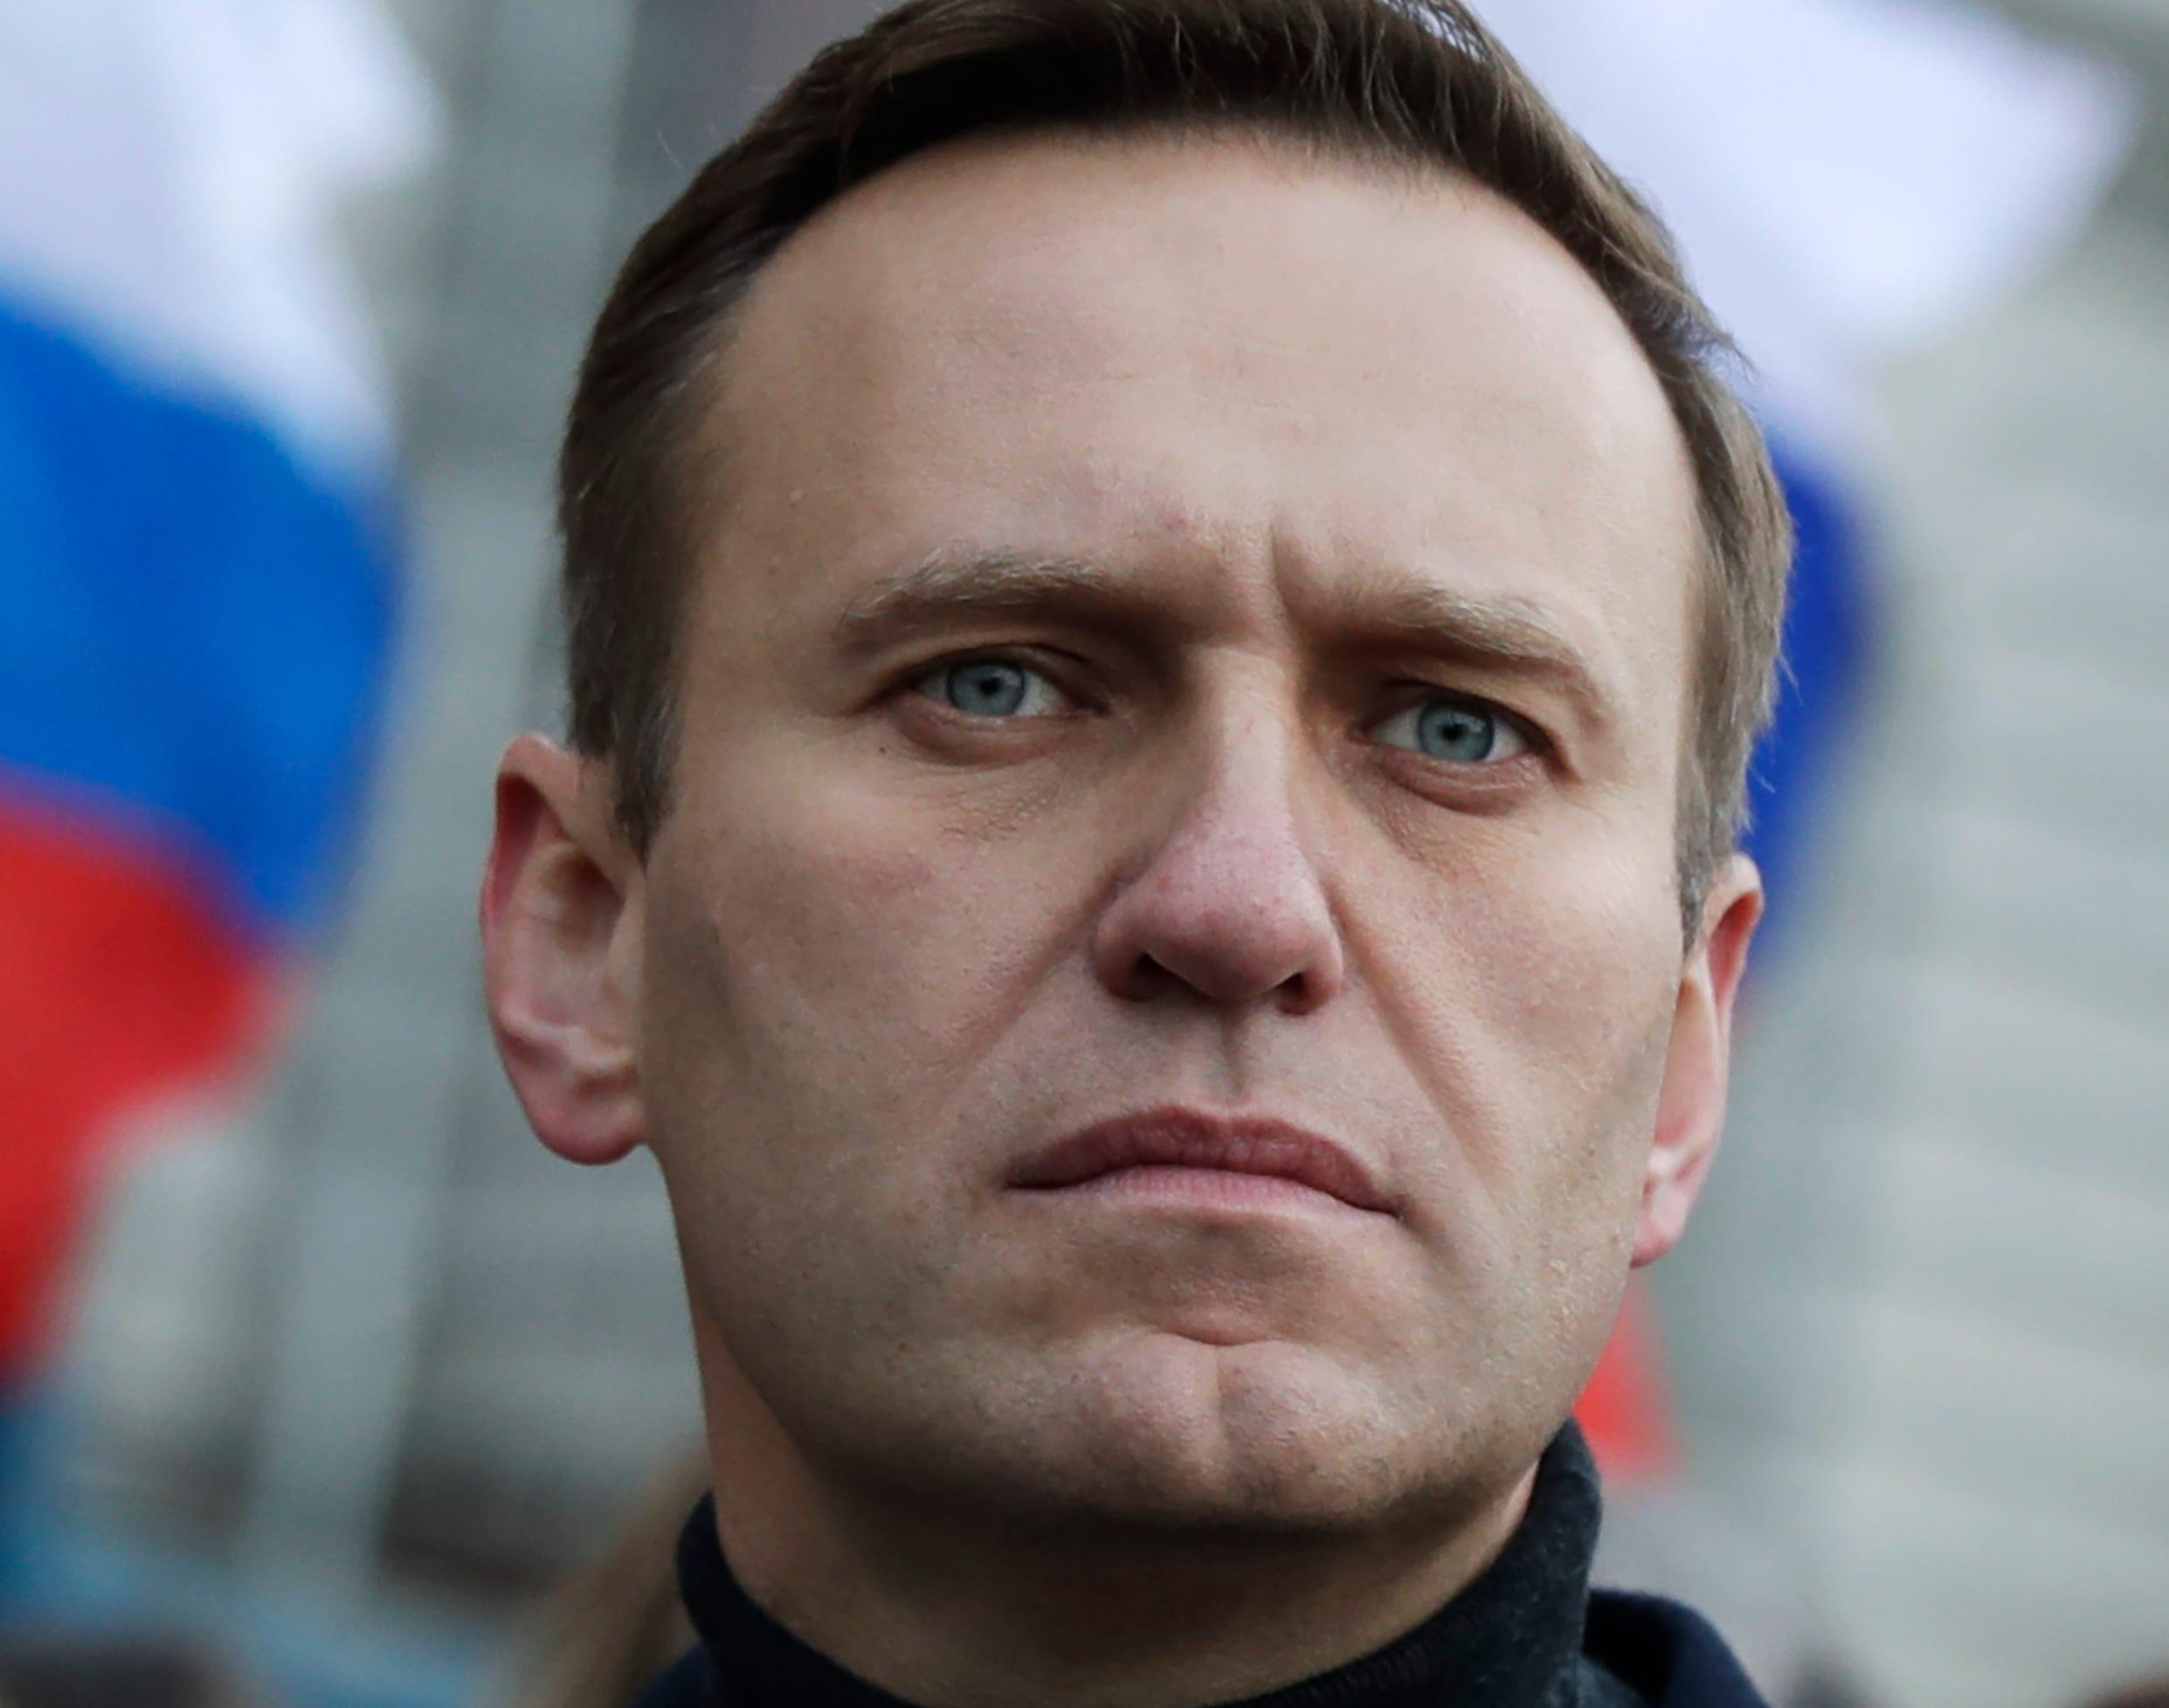 German doctors say comatose Putin critic Alexei Navalny was poisoned